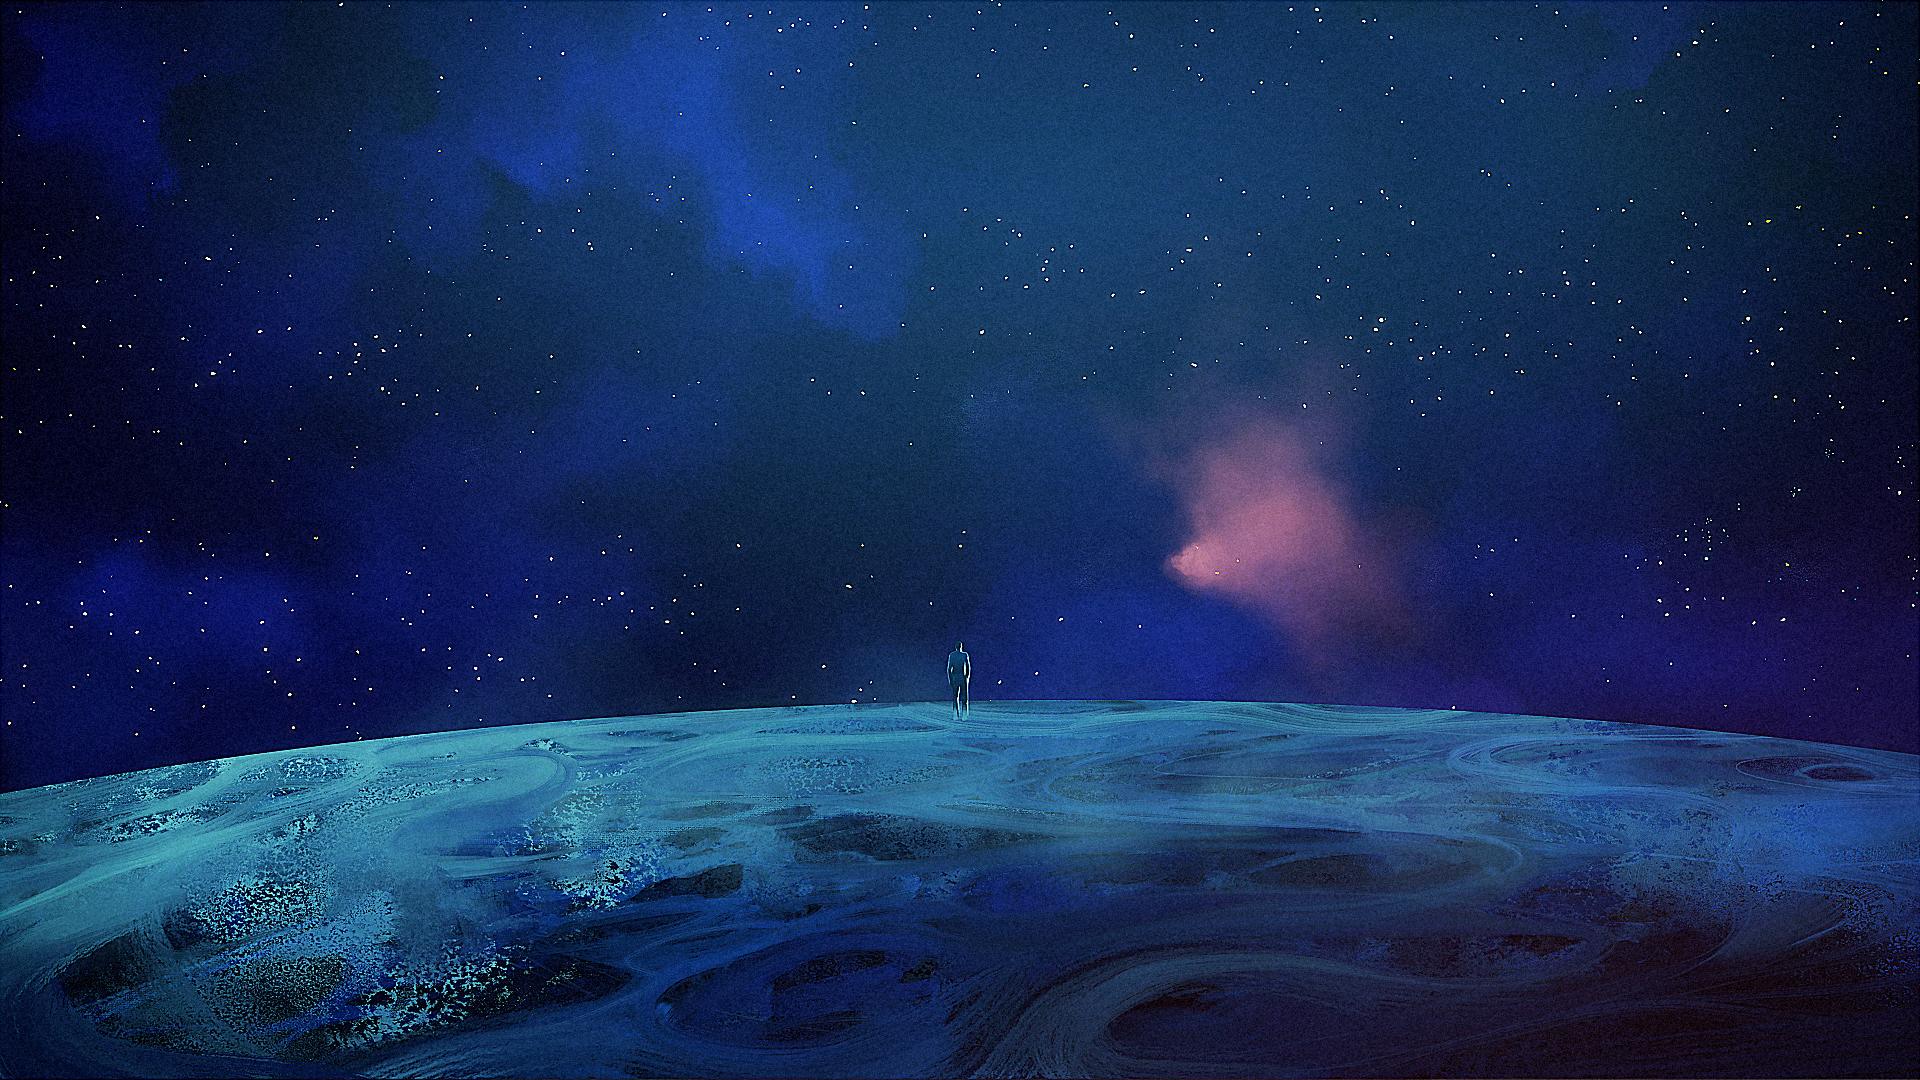 constellation_opening_racoonstudio_cosimomiorelli_animation_7